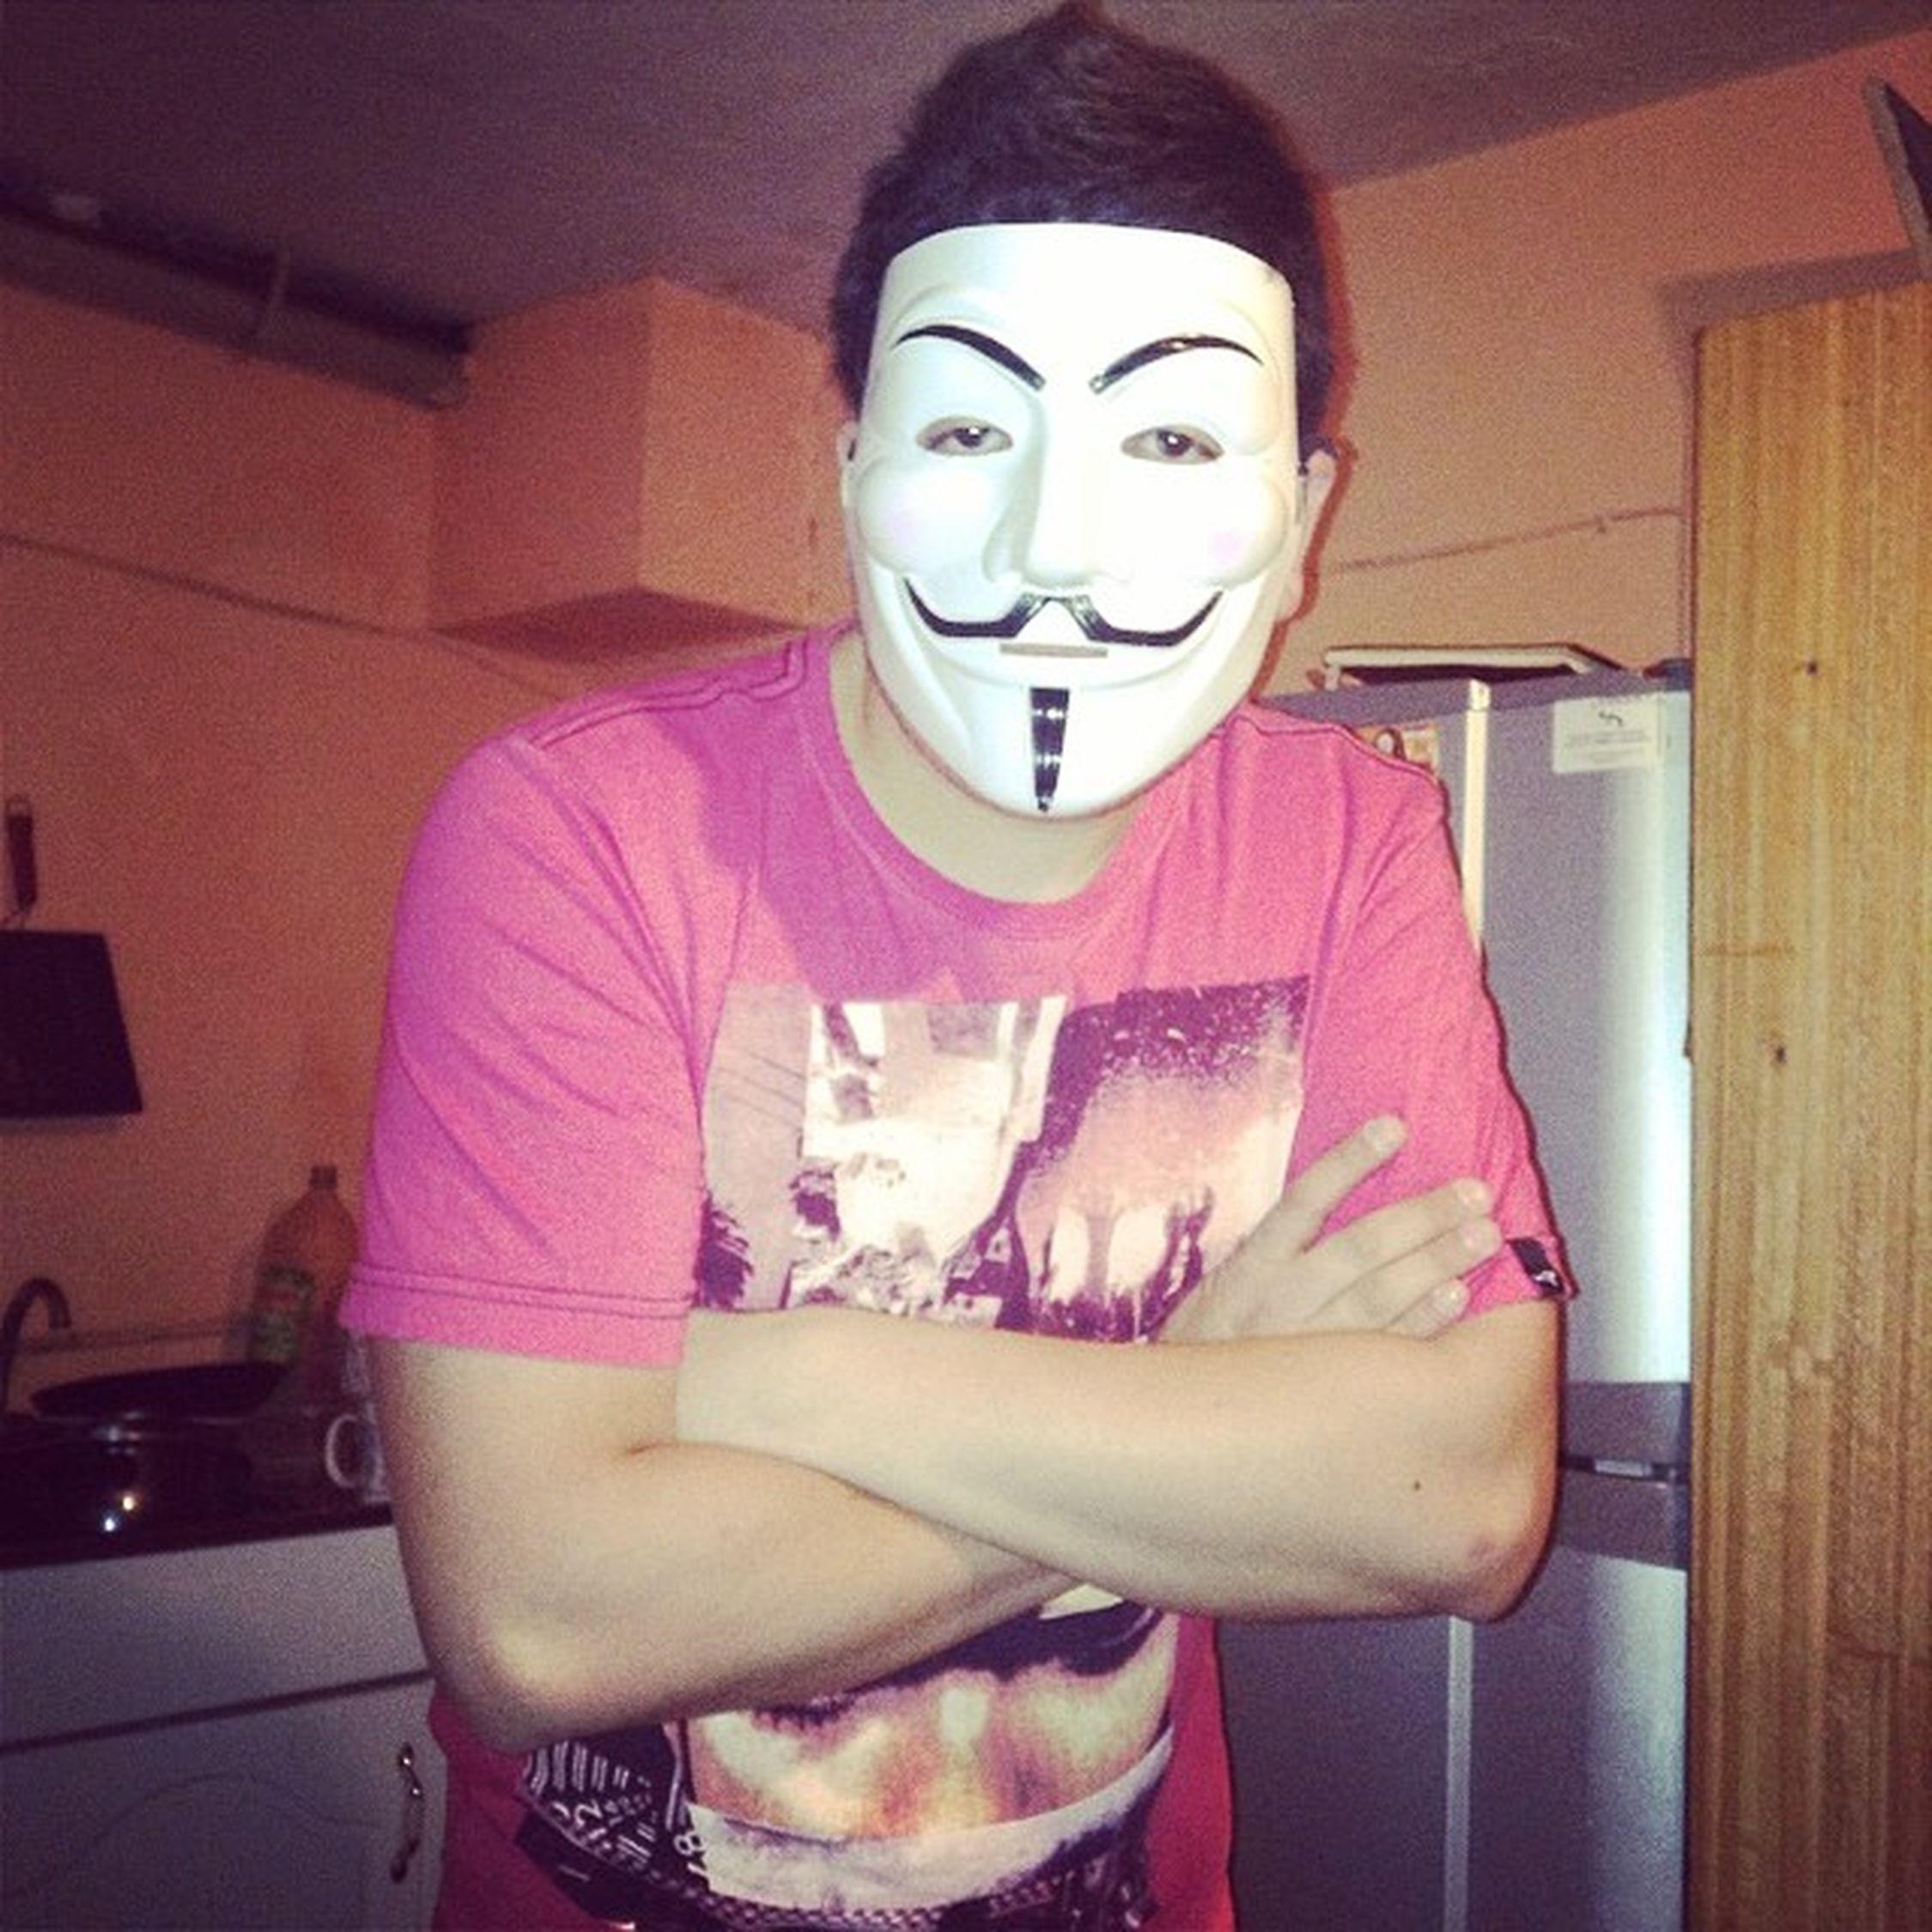 Anonymus FaceWhite